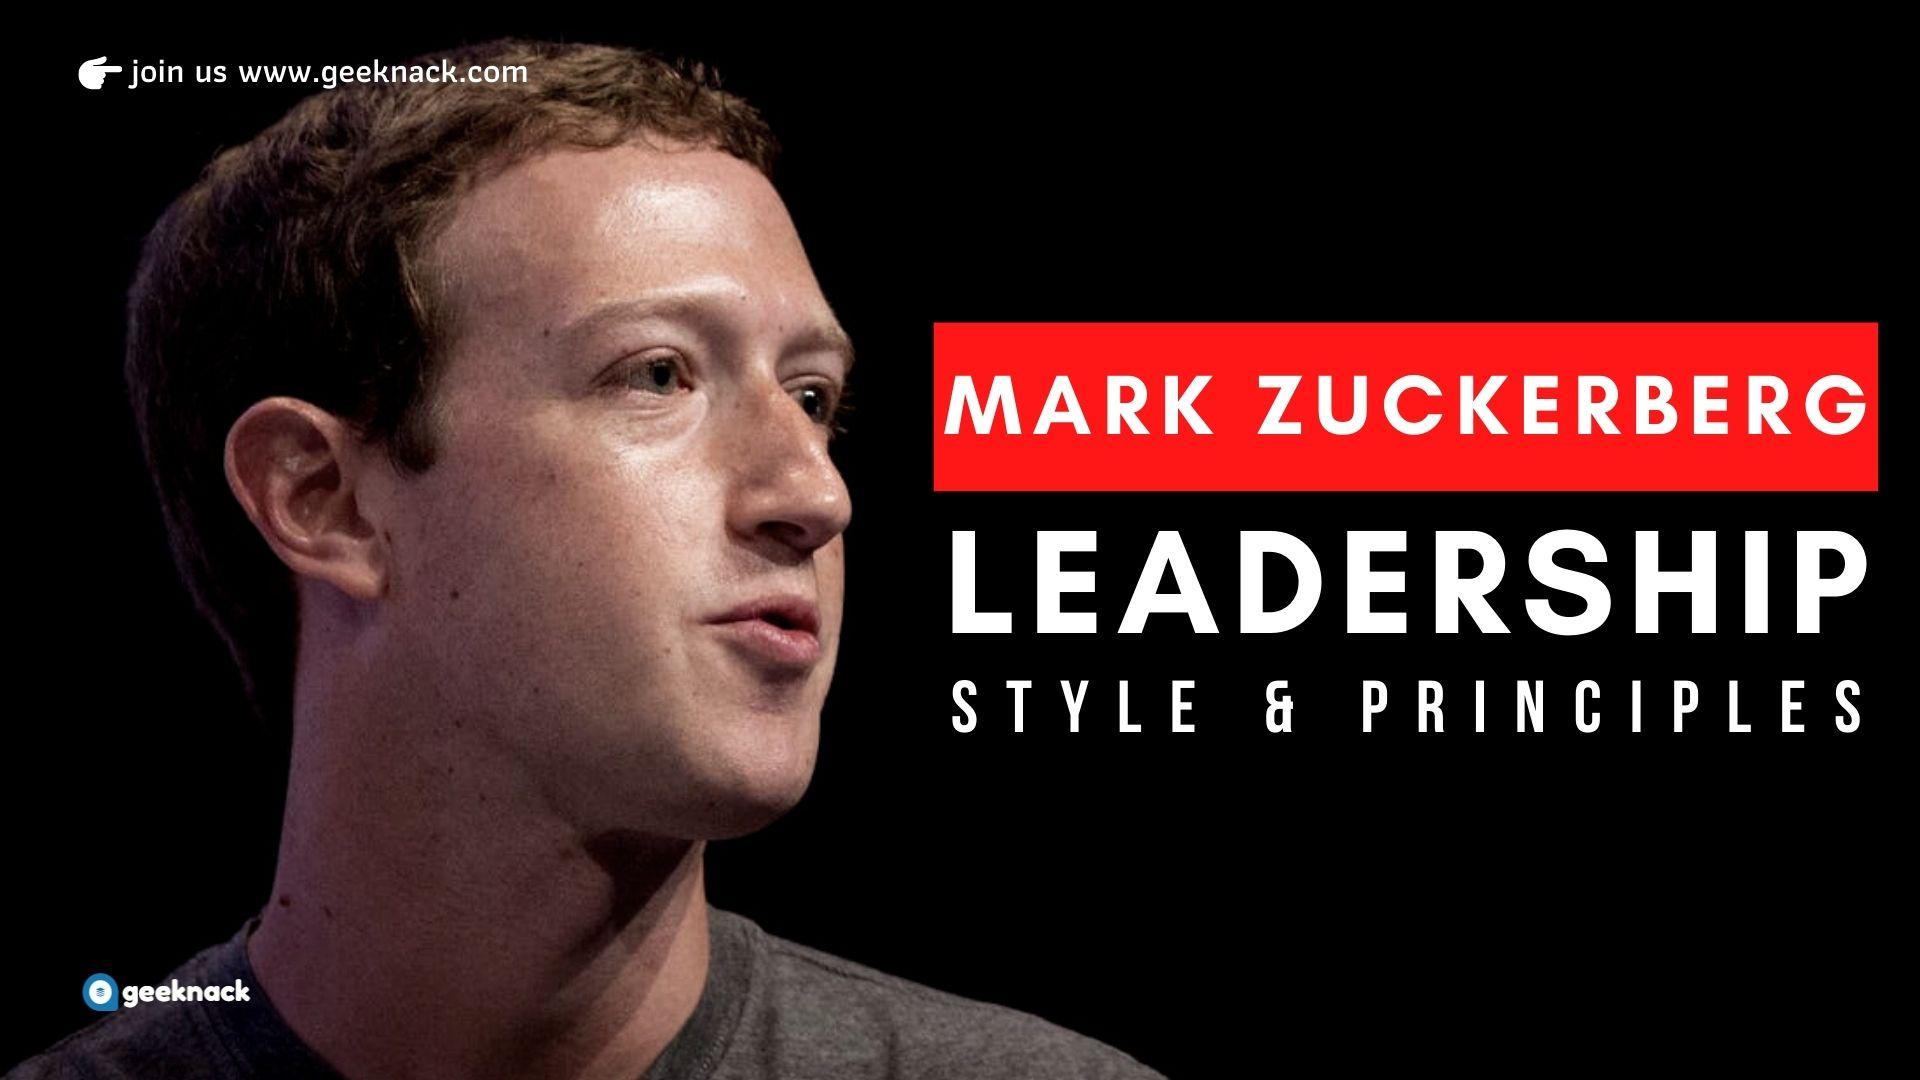 Mak Zuckerberg - Leadership Style and Principles cover